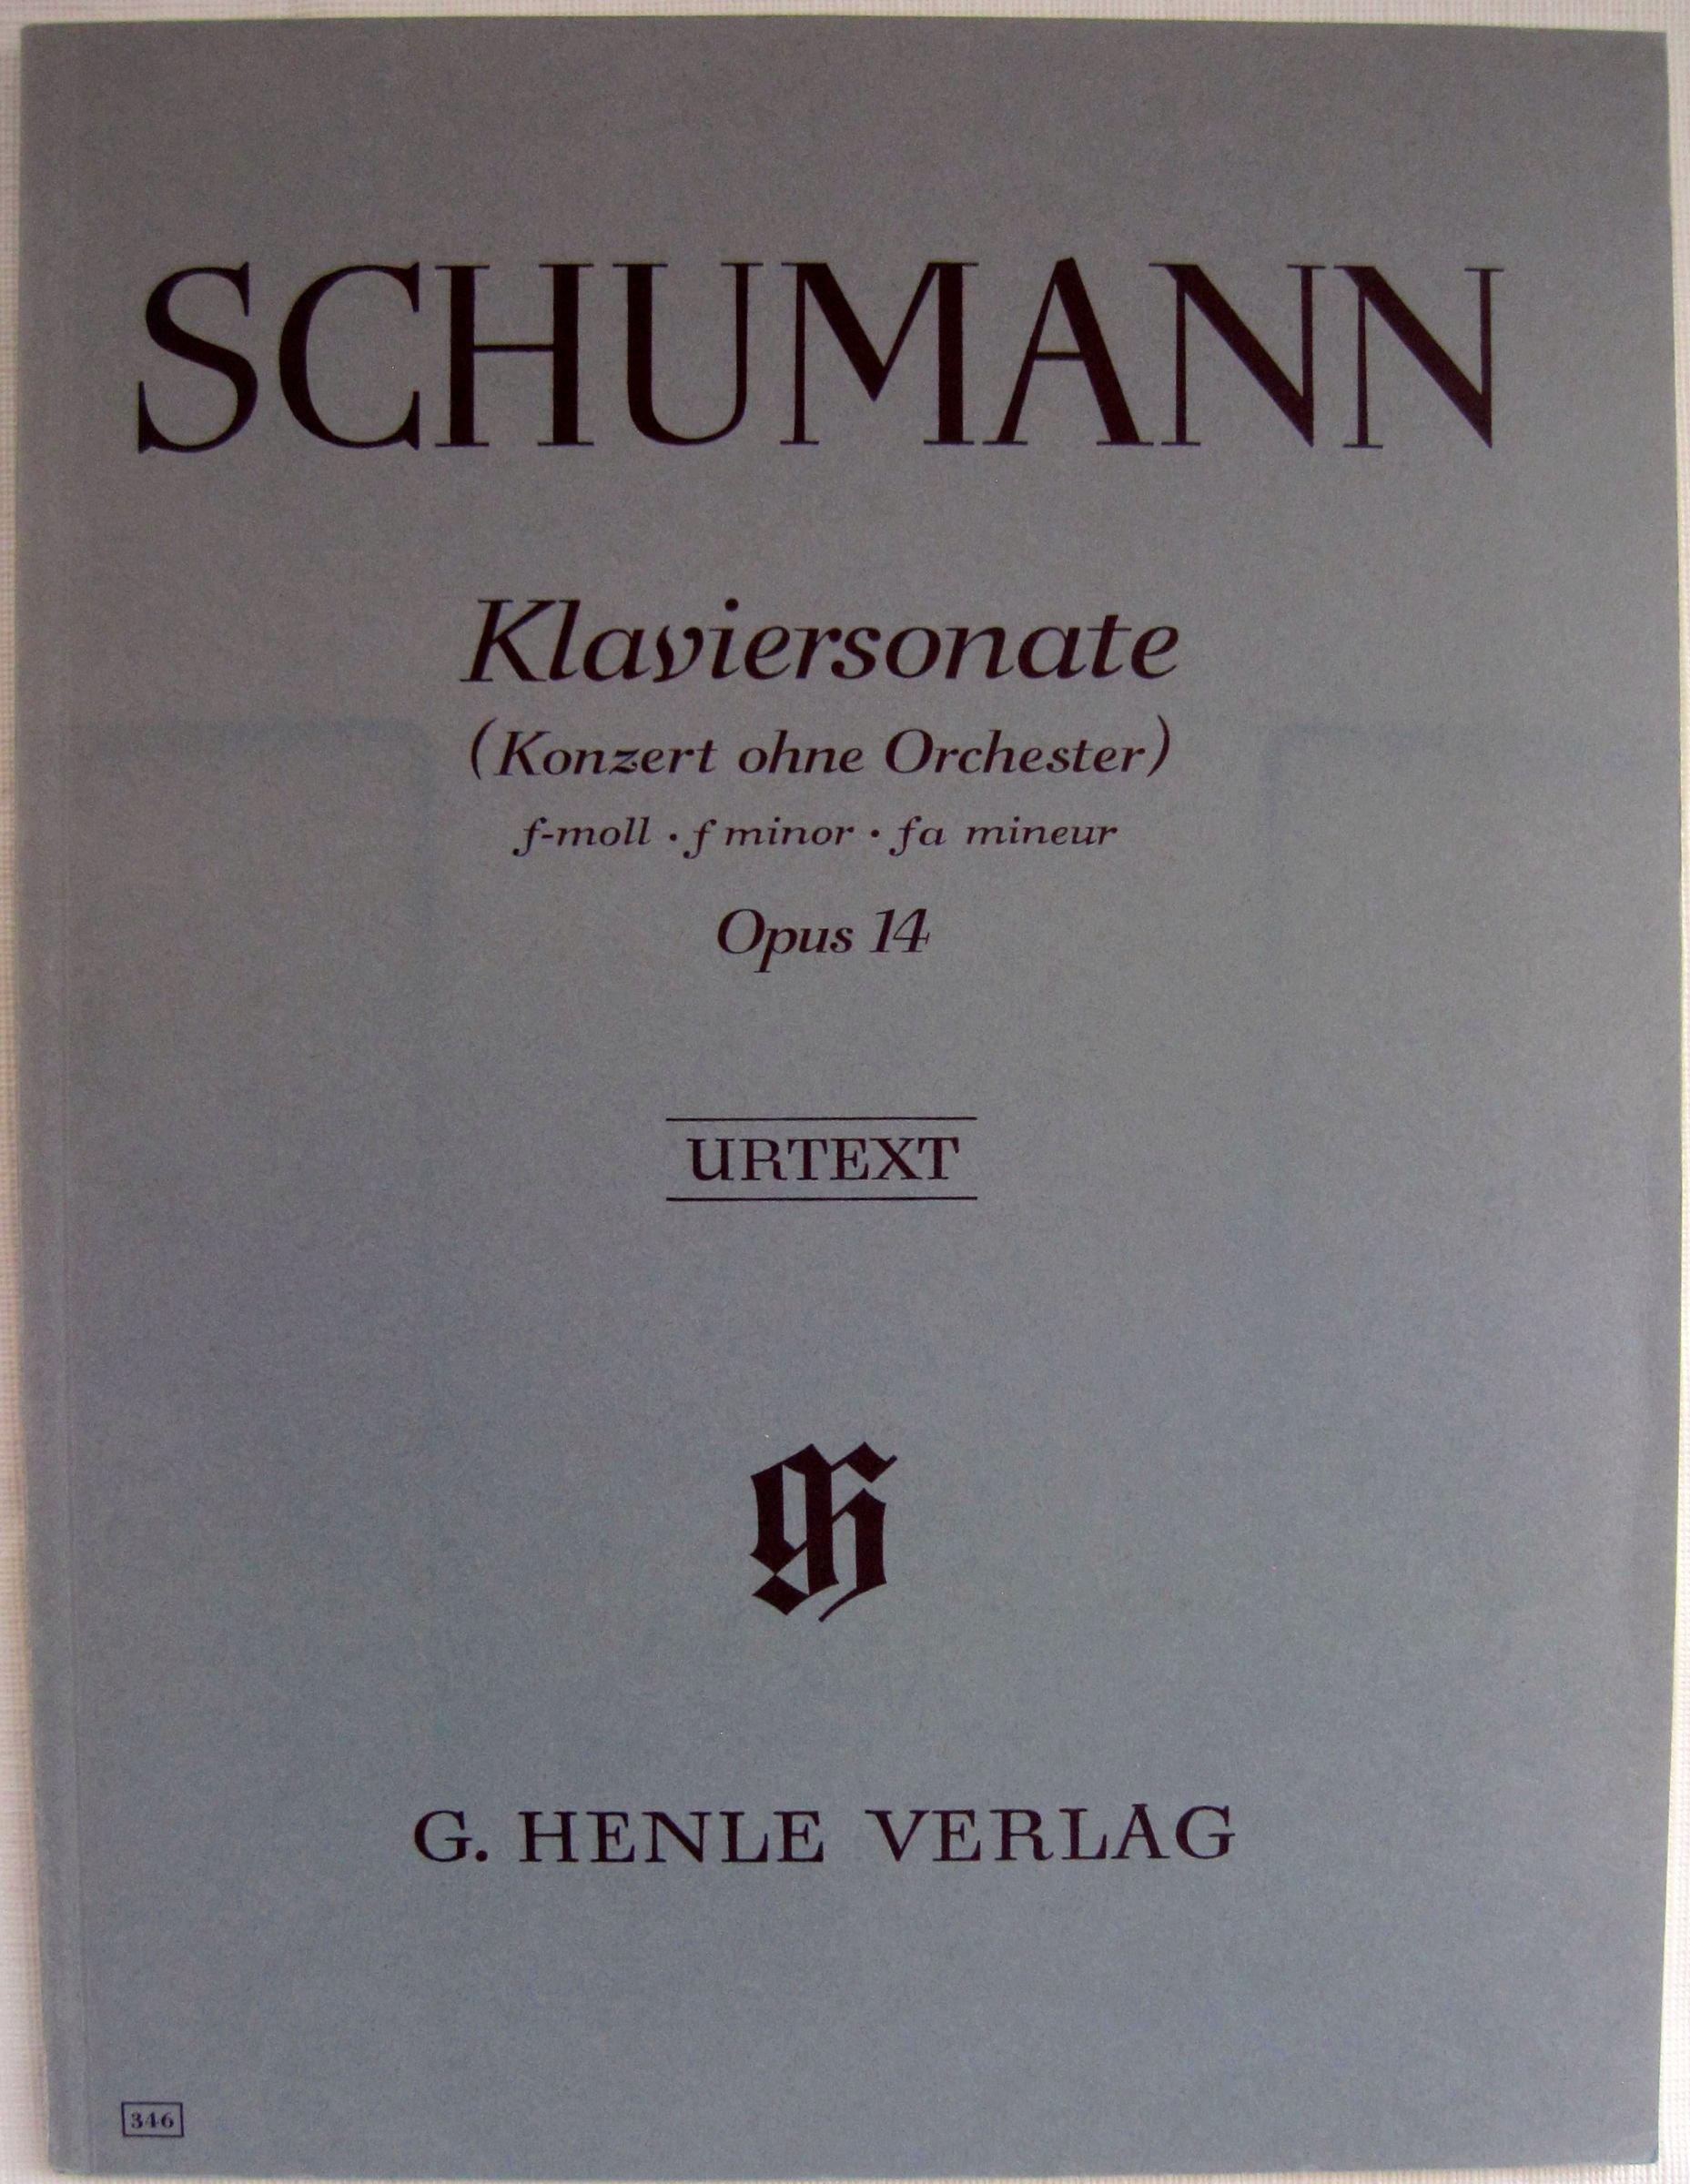 Beethoven Klaviersonate f-moll 1 URTEXT fa mineur Opus 2 Nr f minior